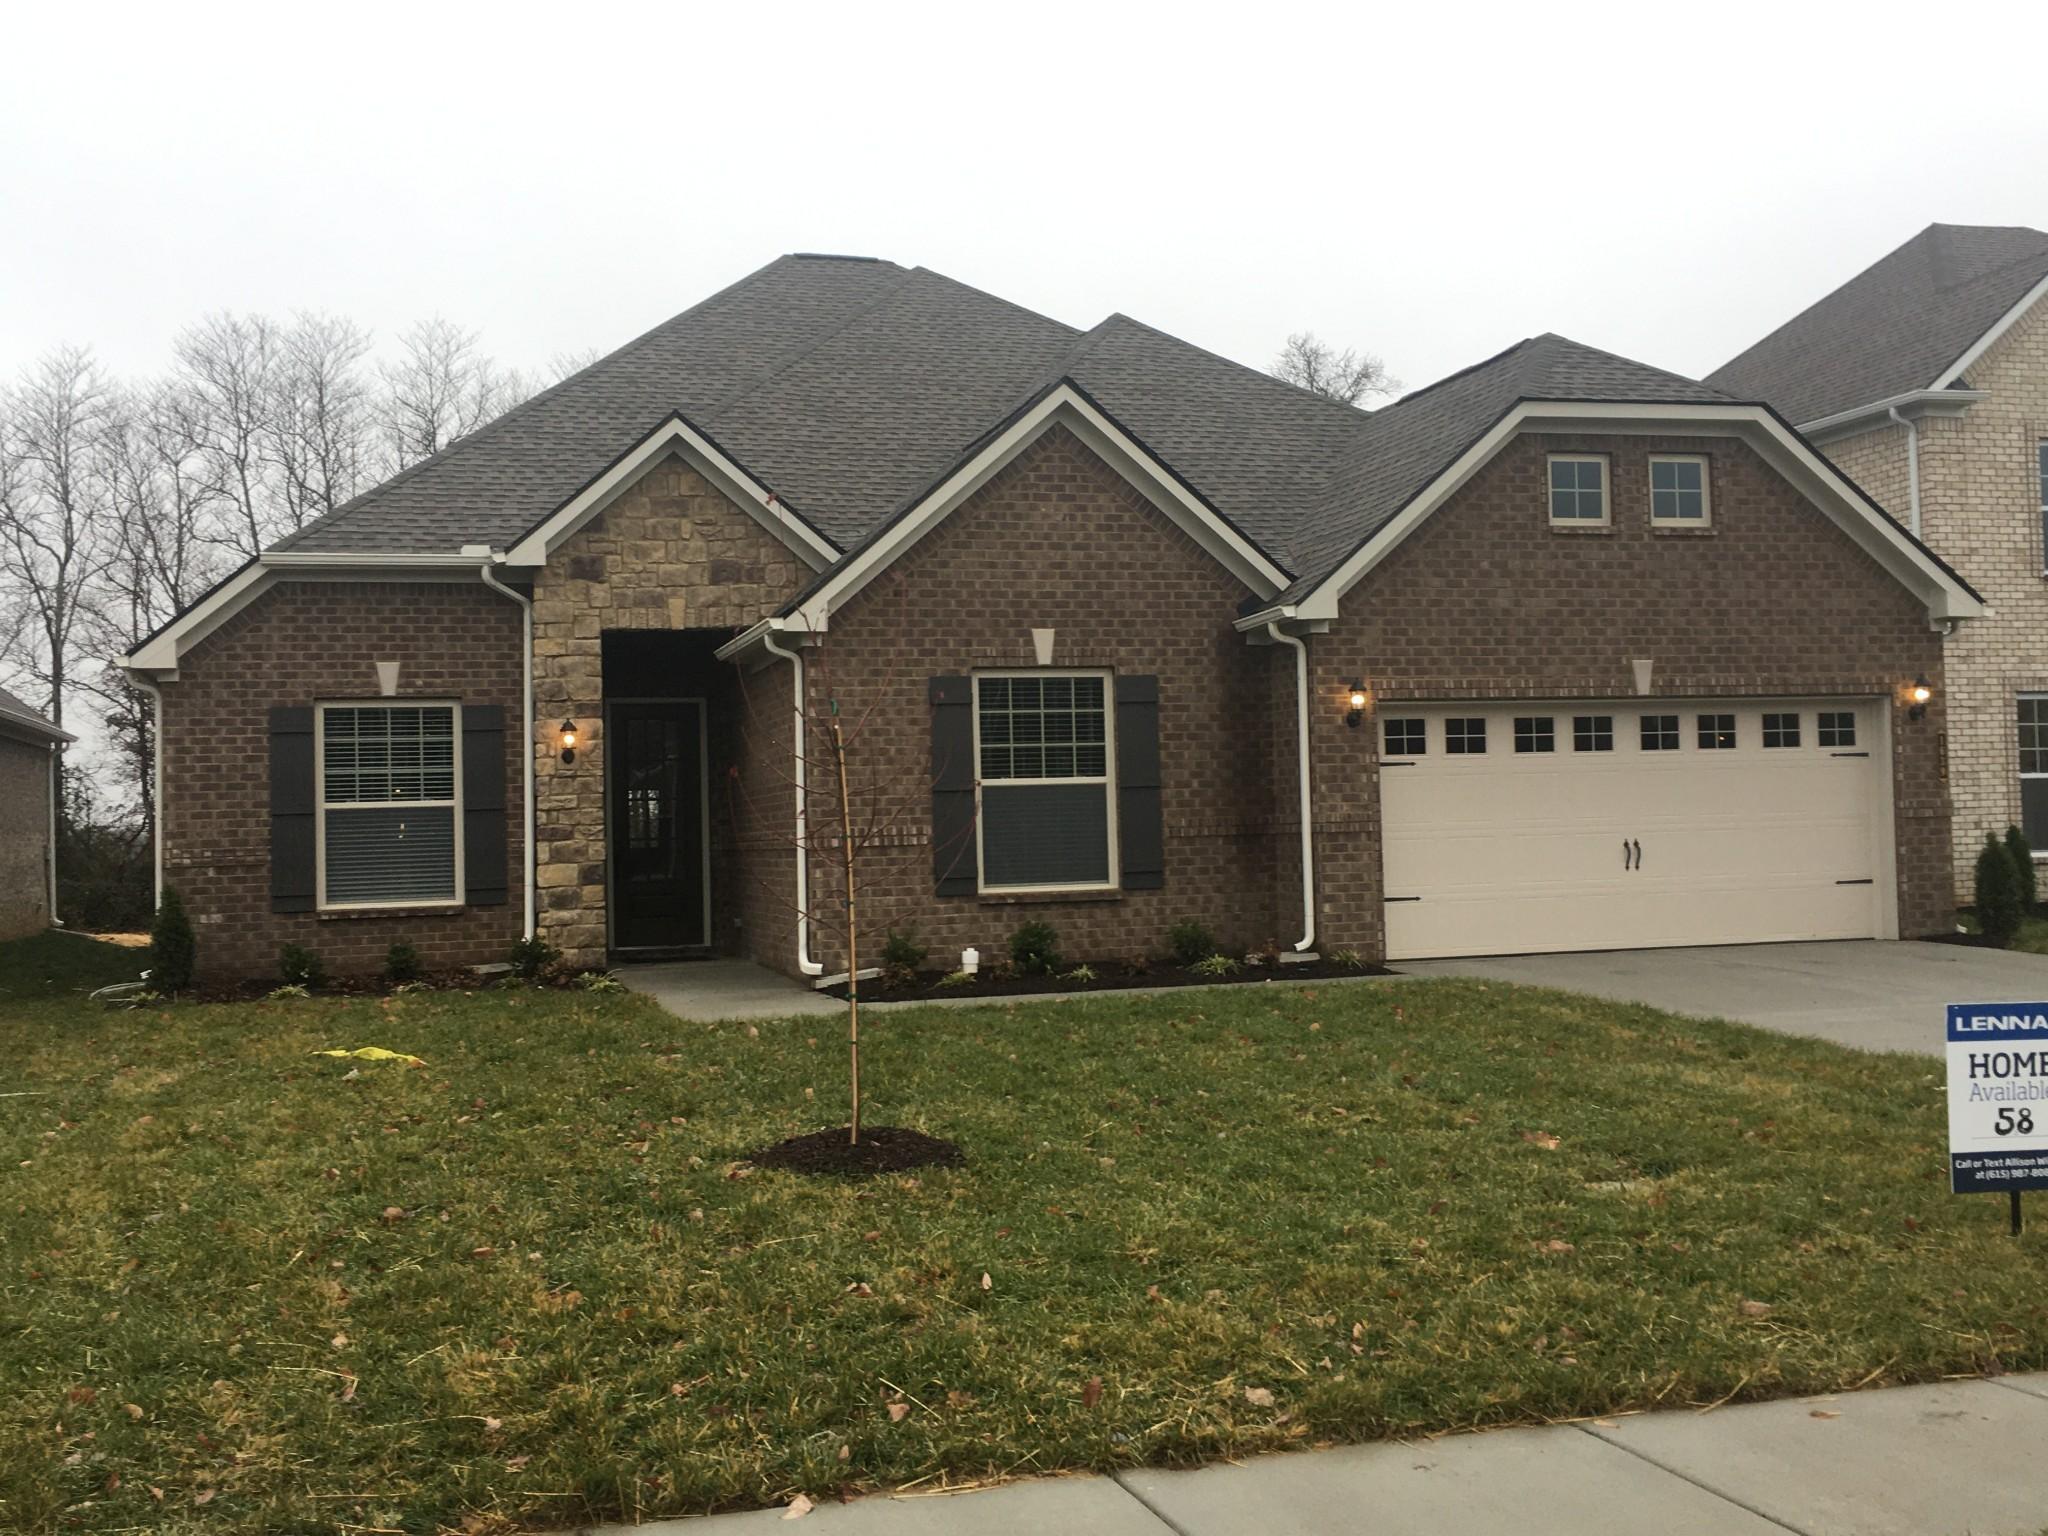 1639 Burrows Ave 58 CHO, Murfreesboro, TN 37129 - Murfreesboro, TN real estate listing